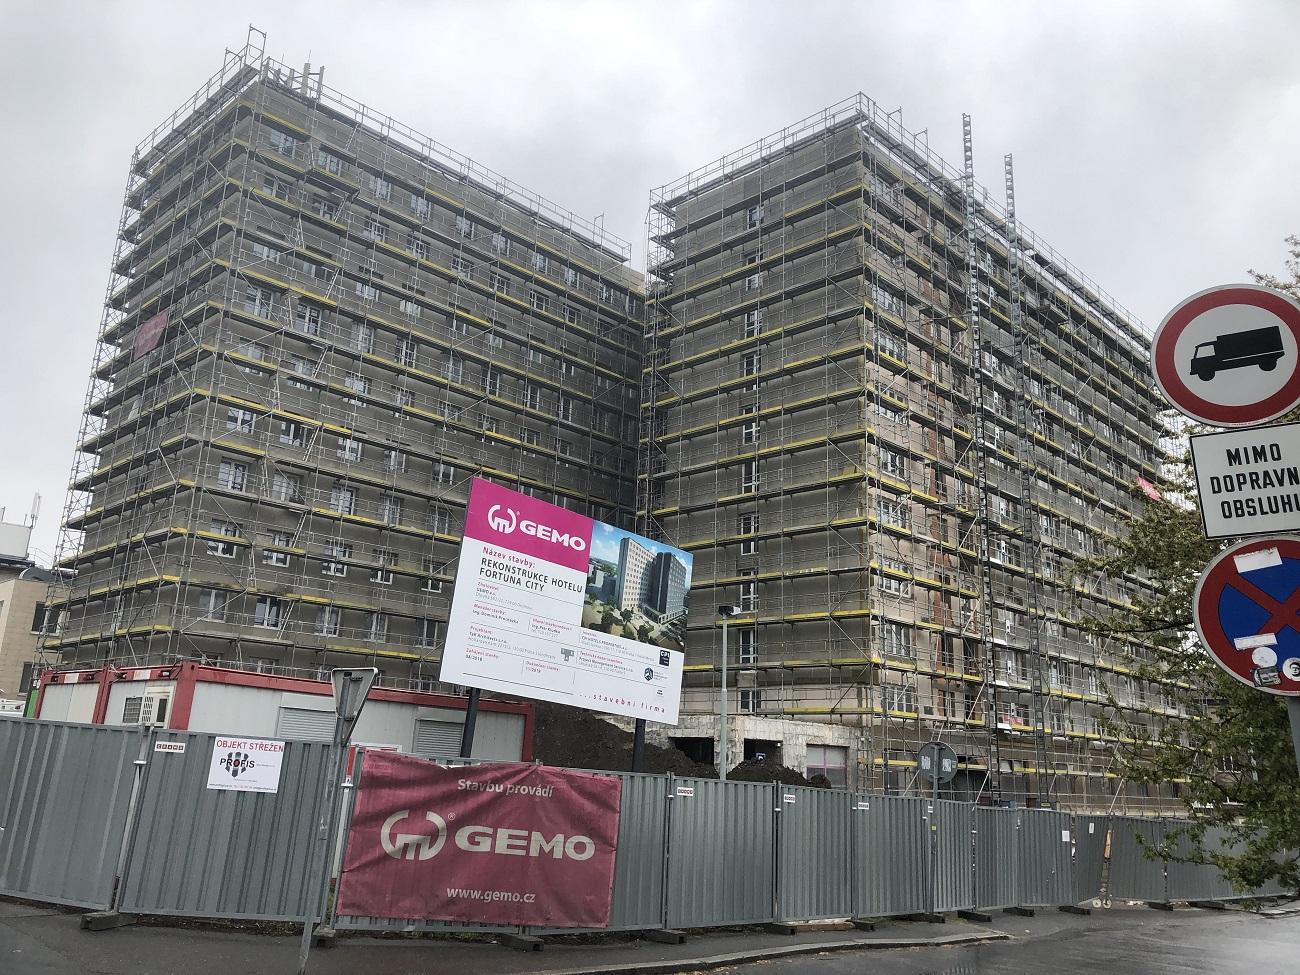 Rekonstrukce pražského Hotelu Fortuna City